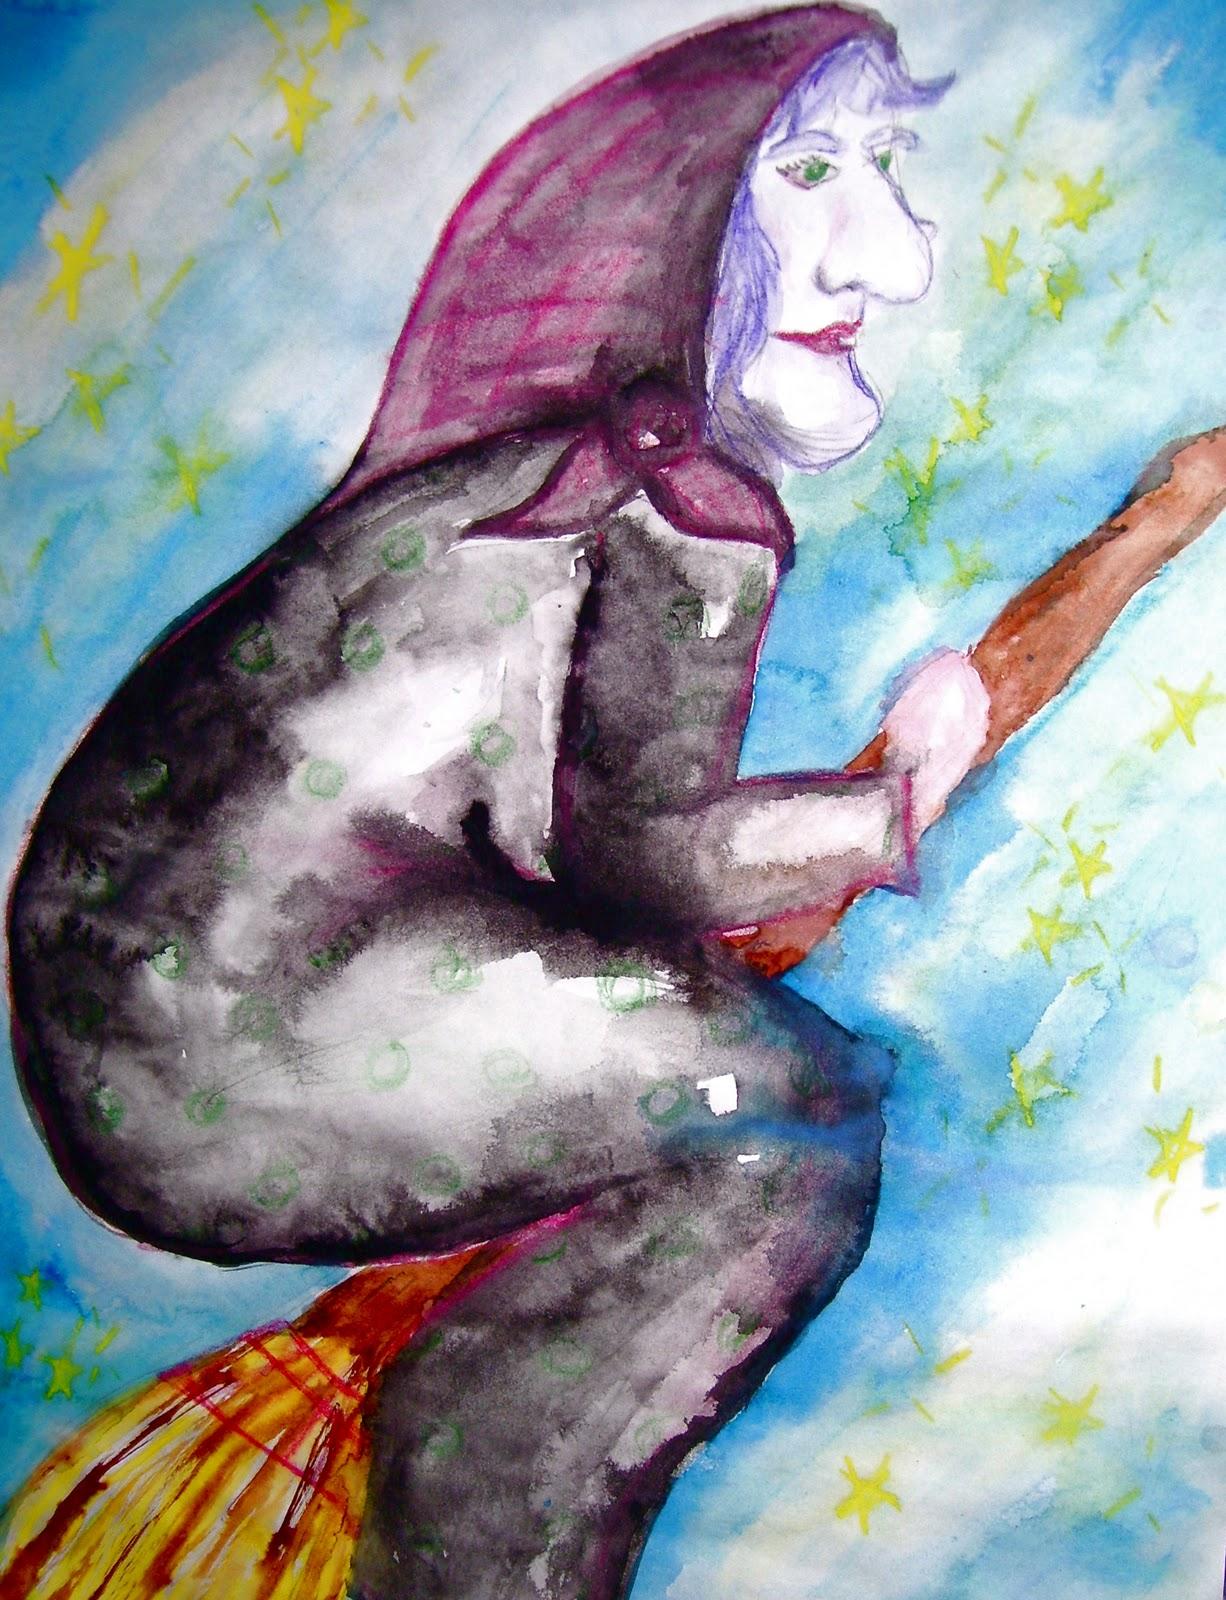 la befana the italian christmas witch - Italian Christmas Witch